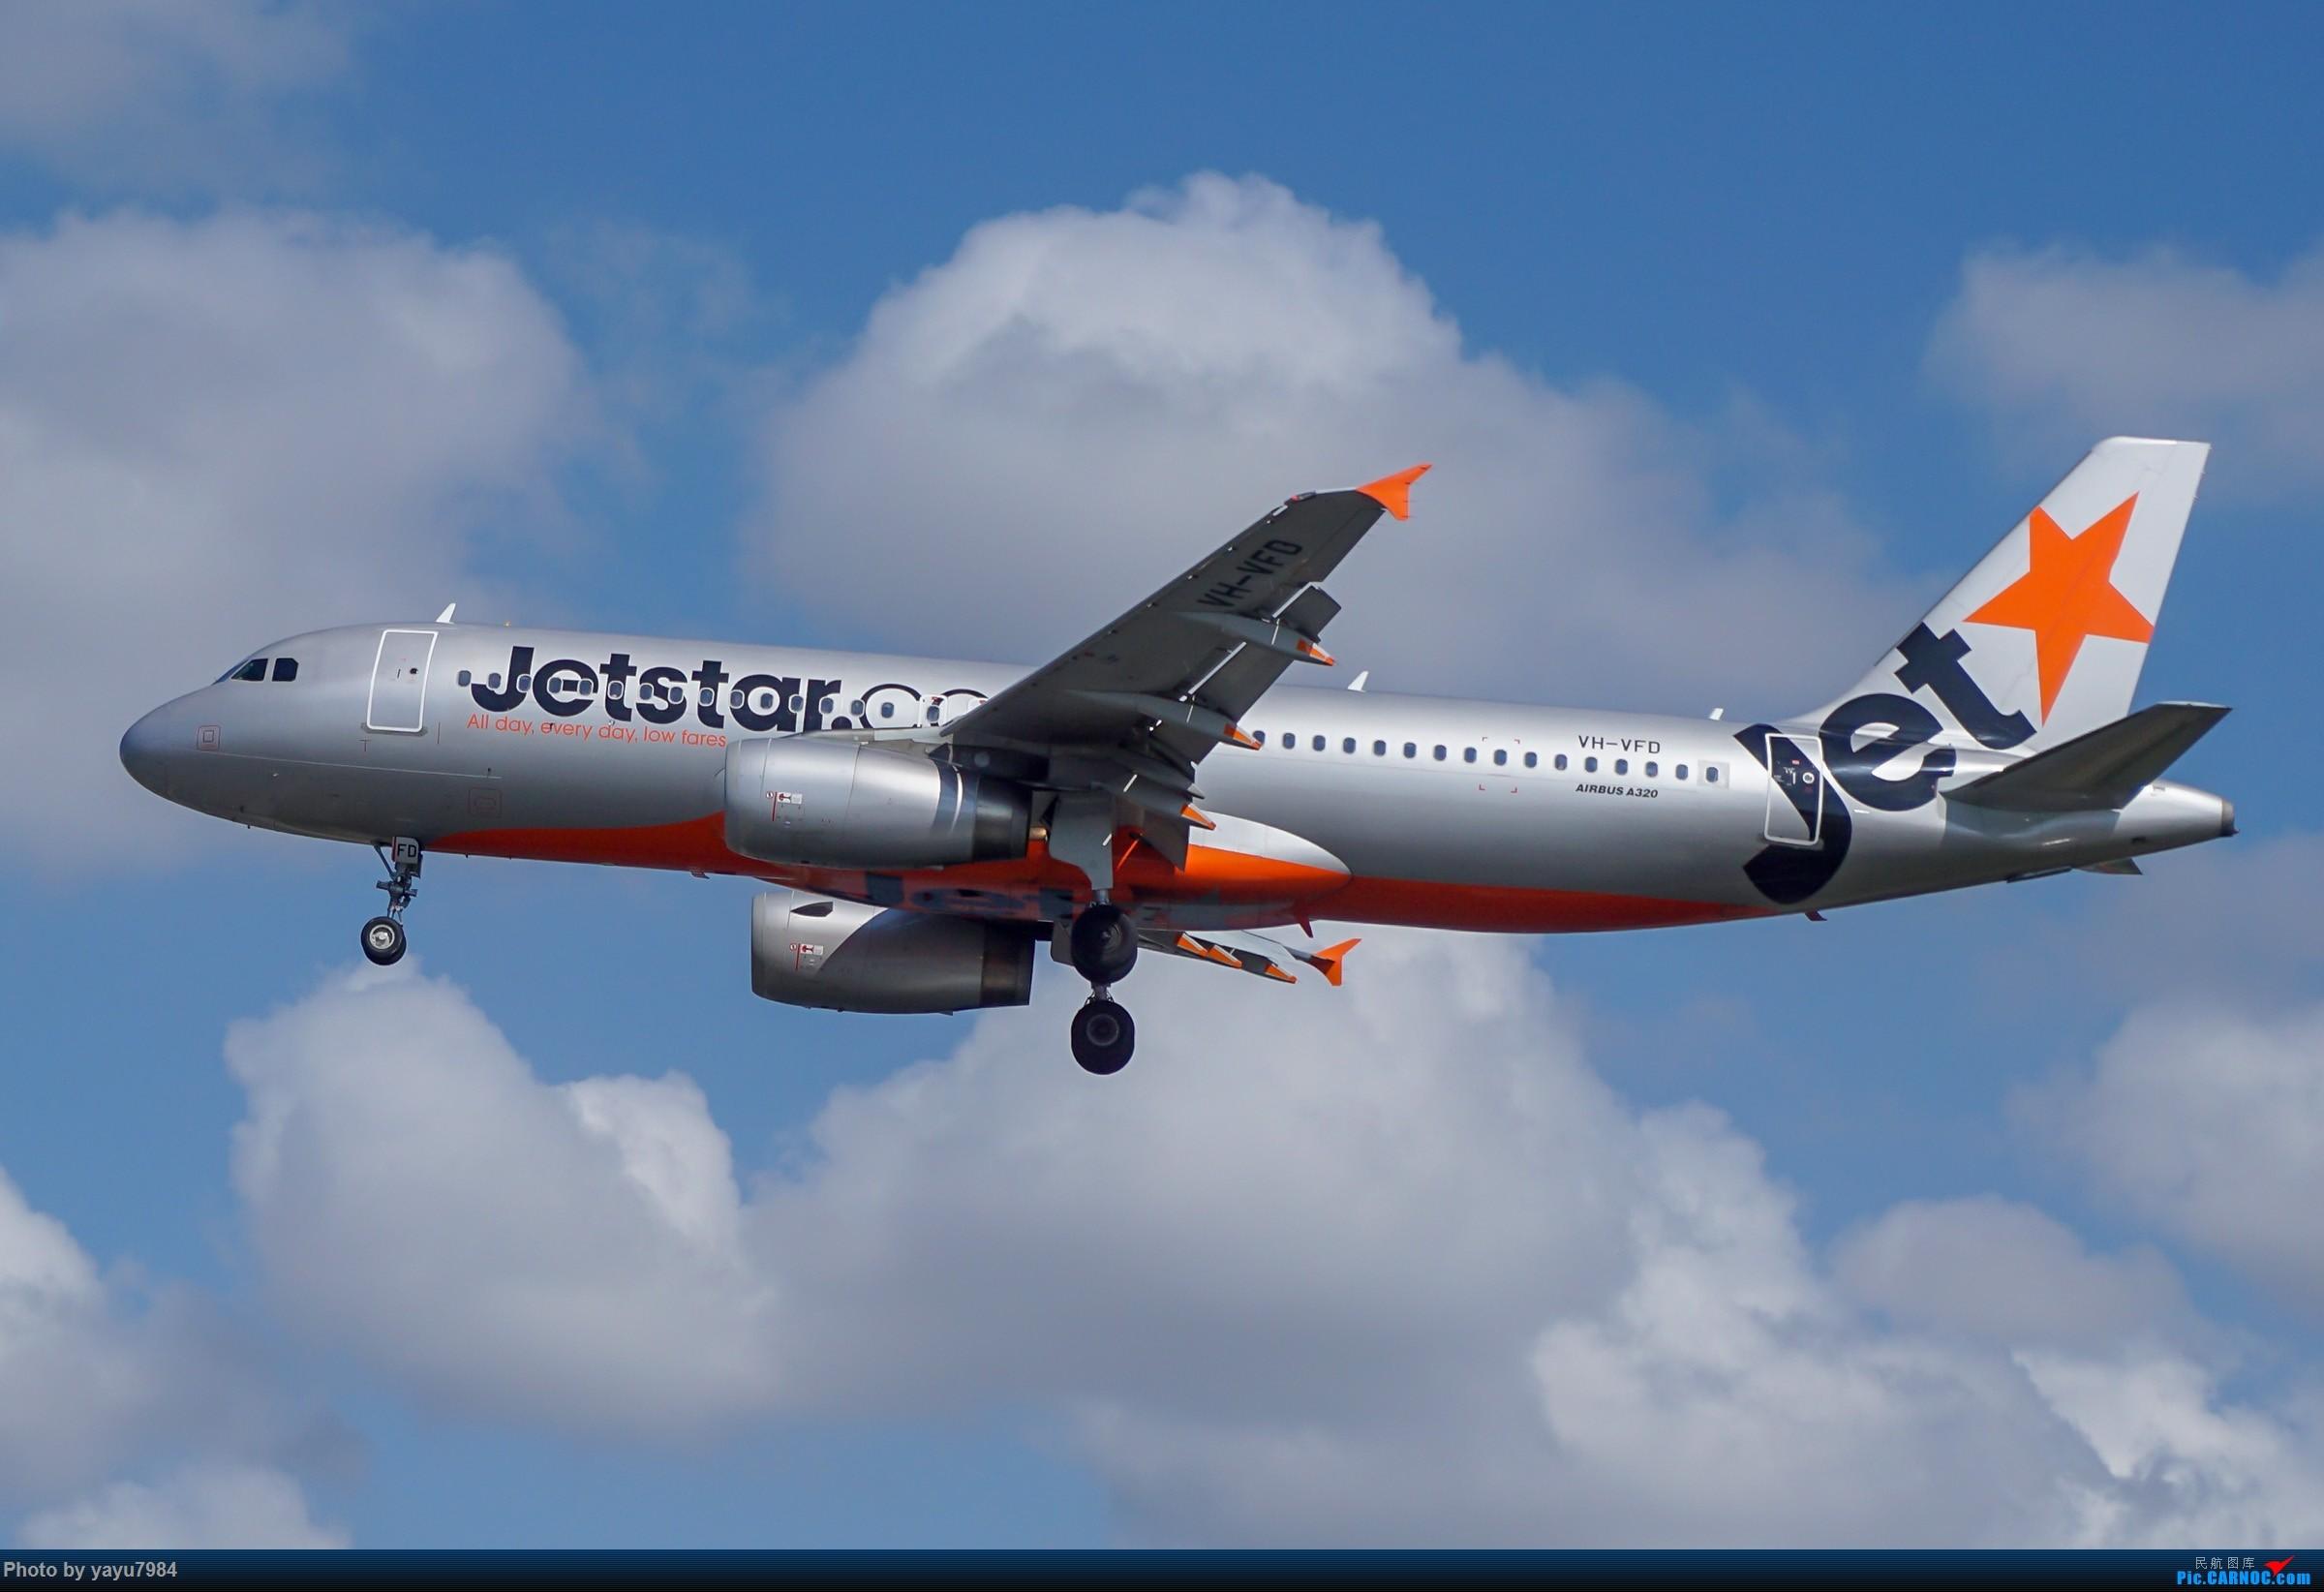 Re:[原创][SYD] 东航天合332,雪绒花343,华航蓝鹊,以及其他日常货 AIRBUS A320-200 VH-VFD 澳大利亚悉尼金斯福德·史密斯机场